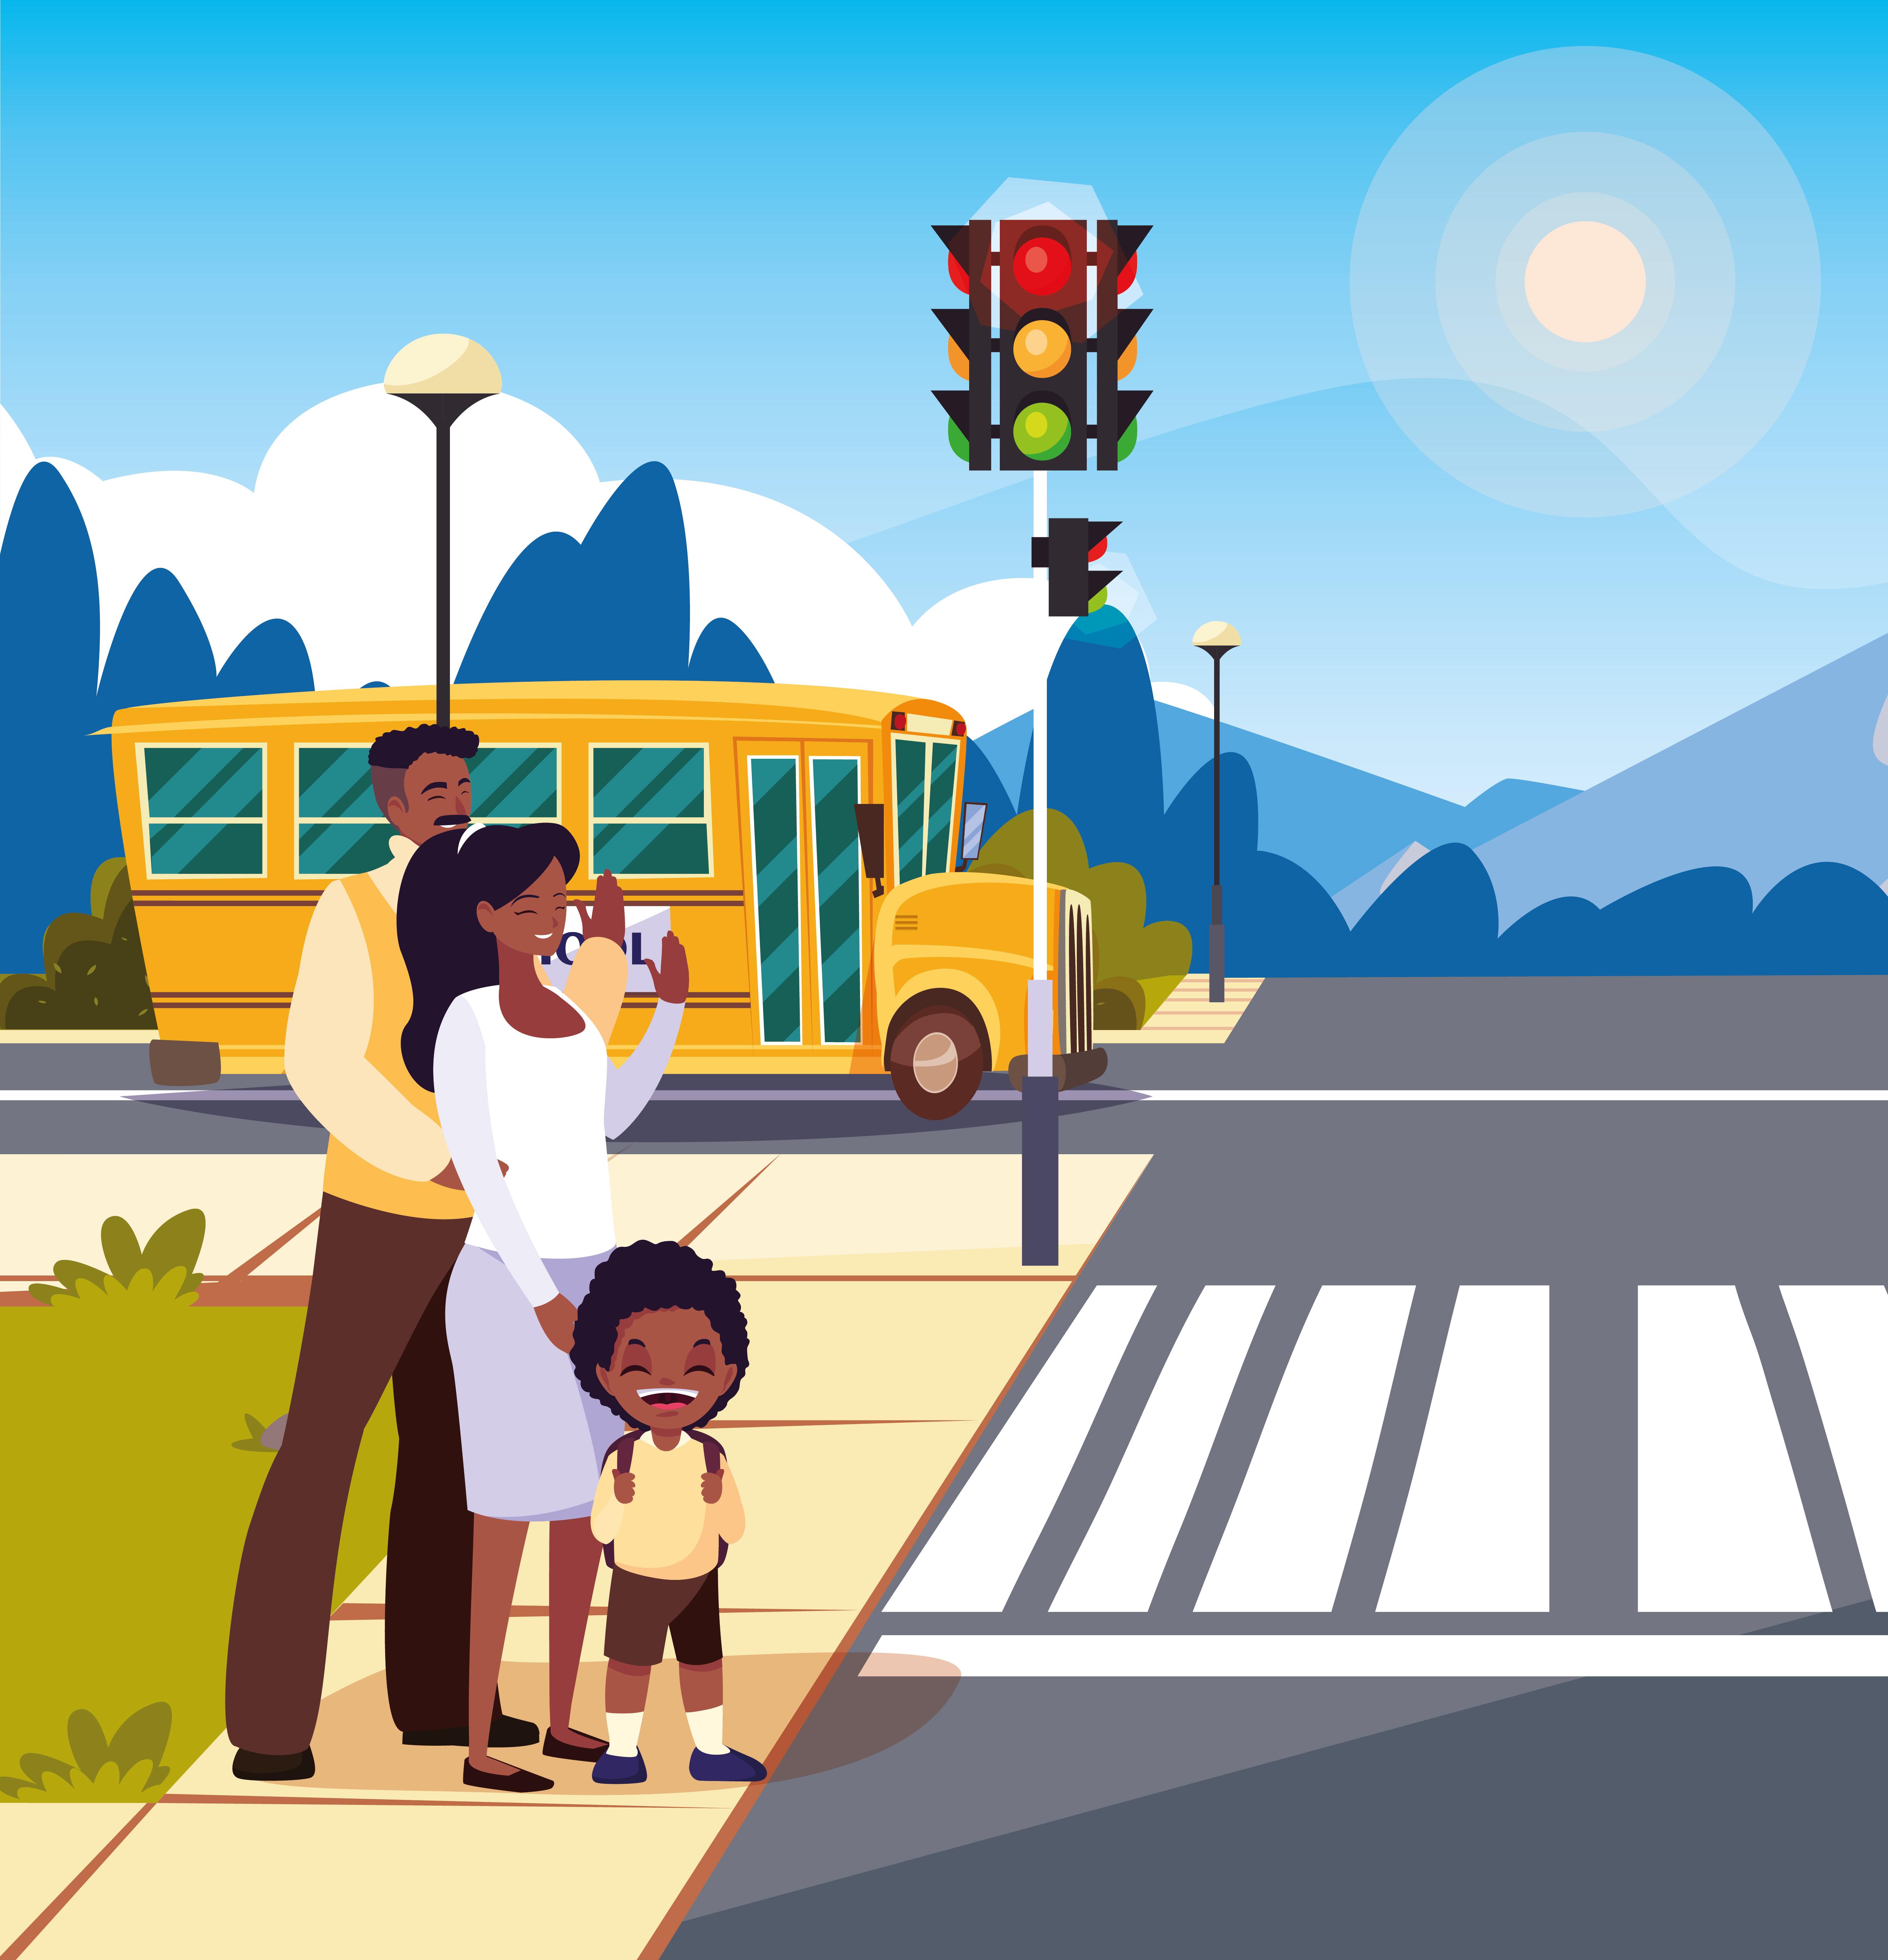 parents with boy waiting school bus - Download Free Vectors, Clipart Graphics & Vector Art